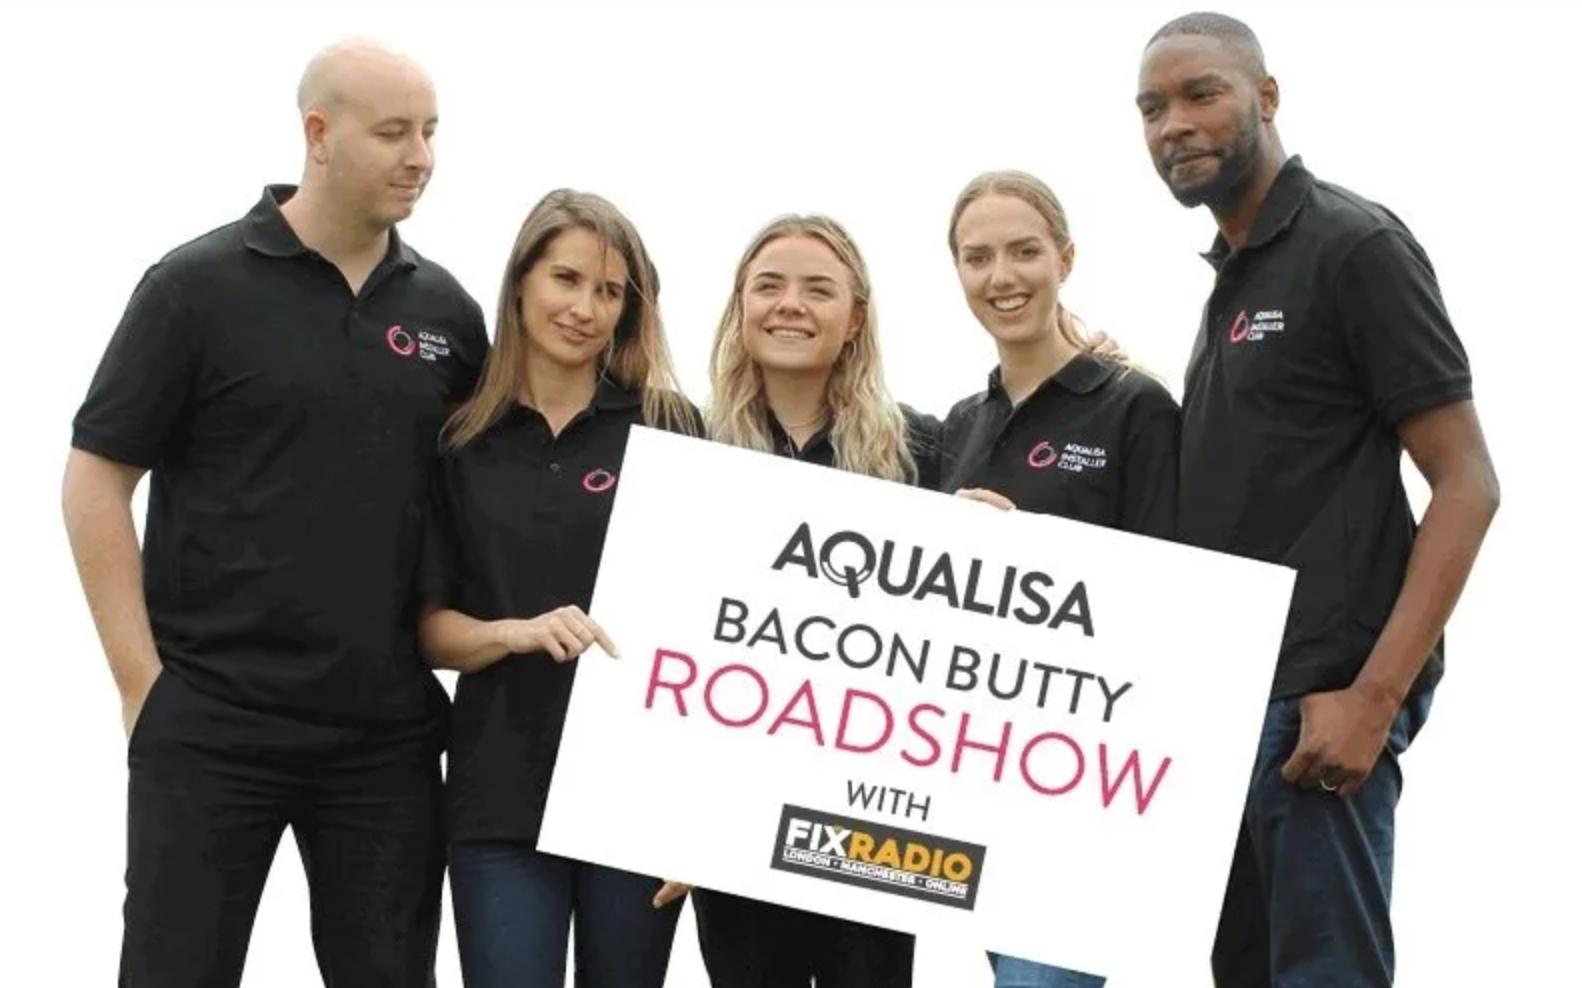 Aqualisa's 'Bacon Butty' Roadshow